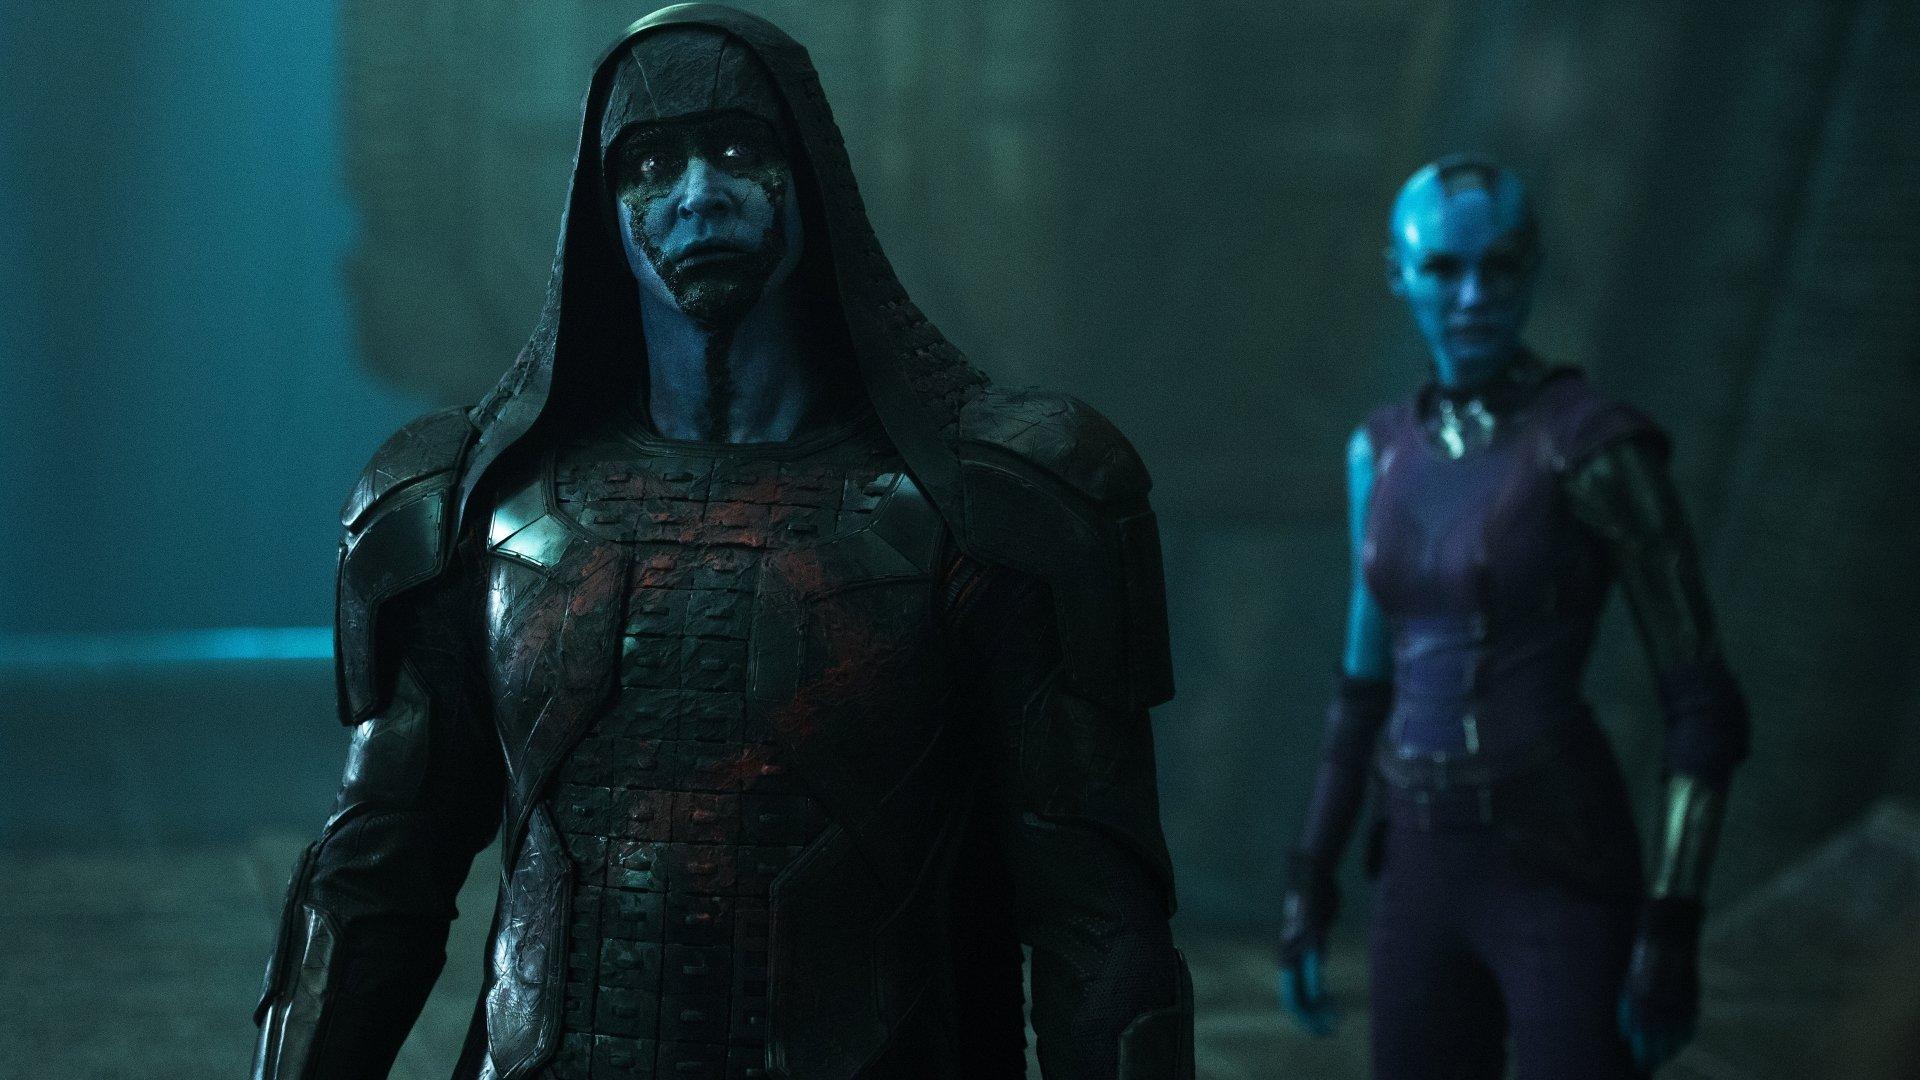 Movie - Guardians of the Galaxy  Lee Pace Karen Gillan Nebula (Marvel Comics) Ronan the Accuser Wallpaper